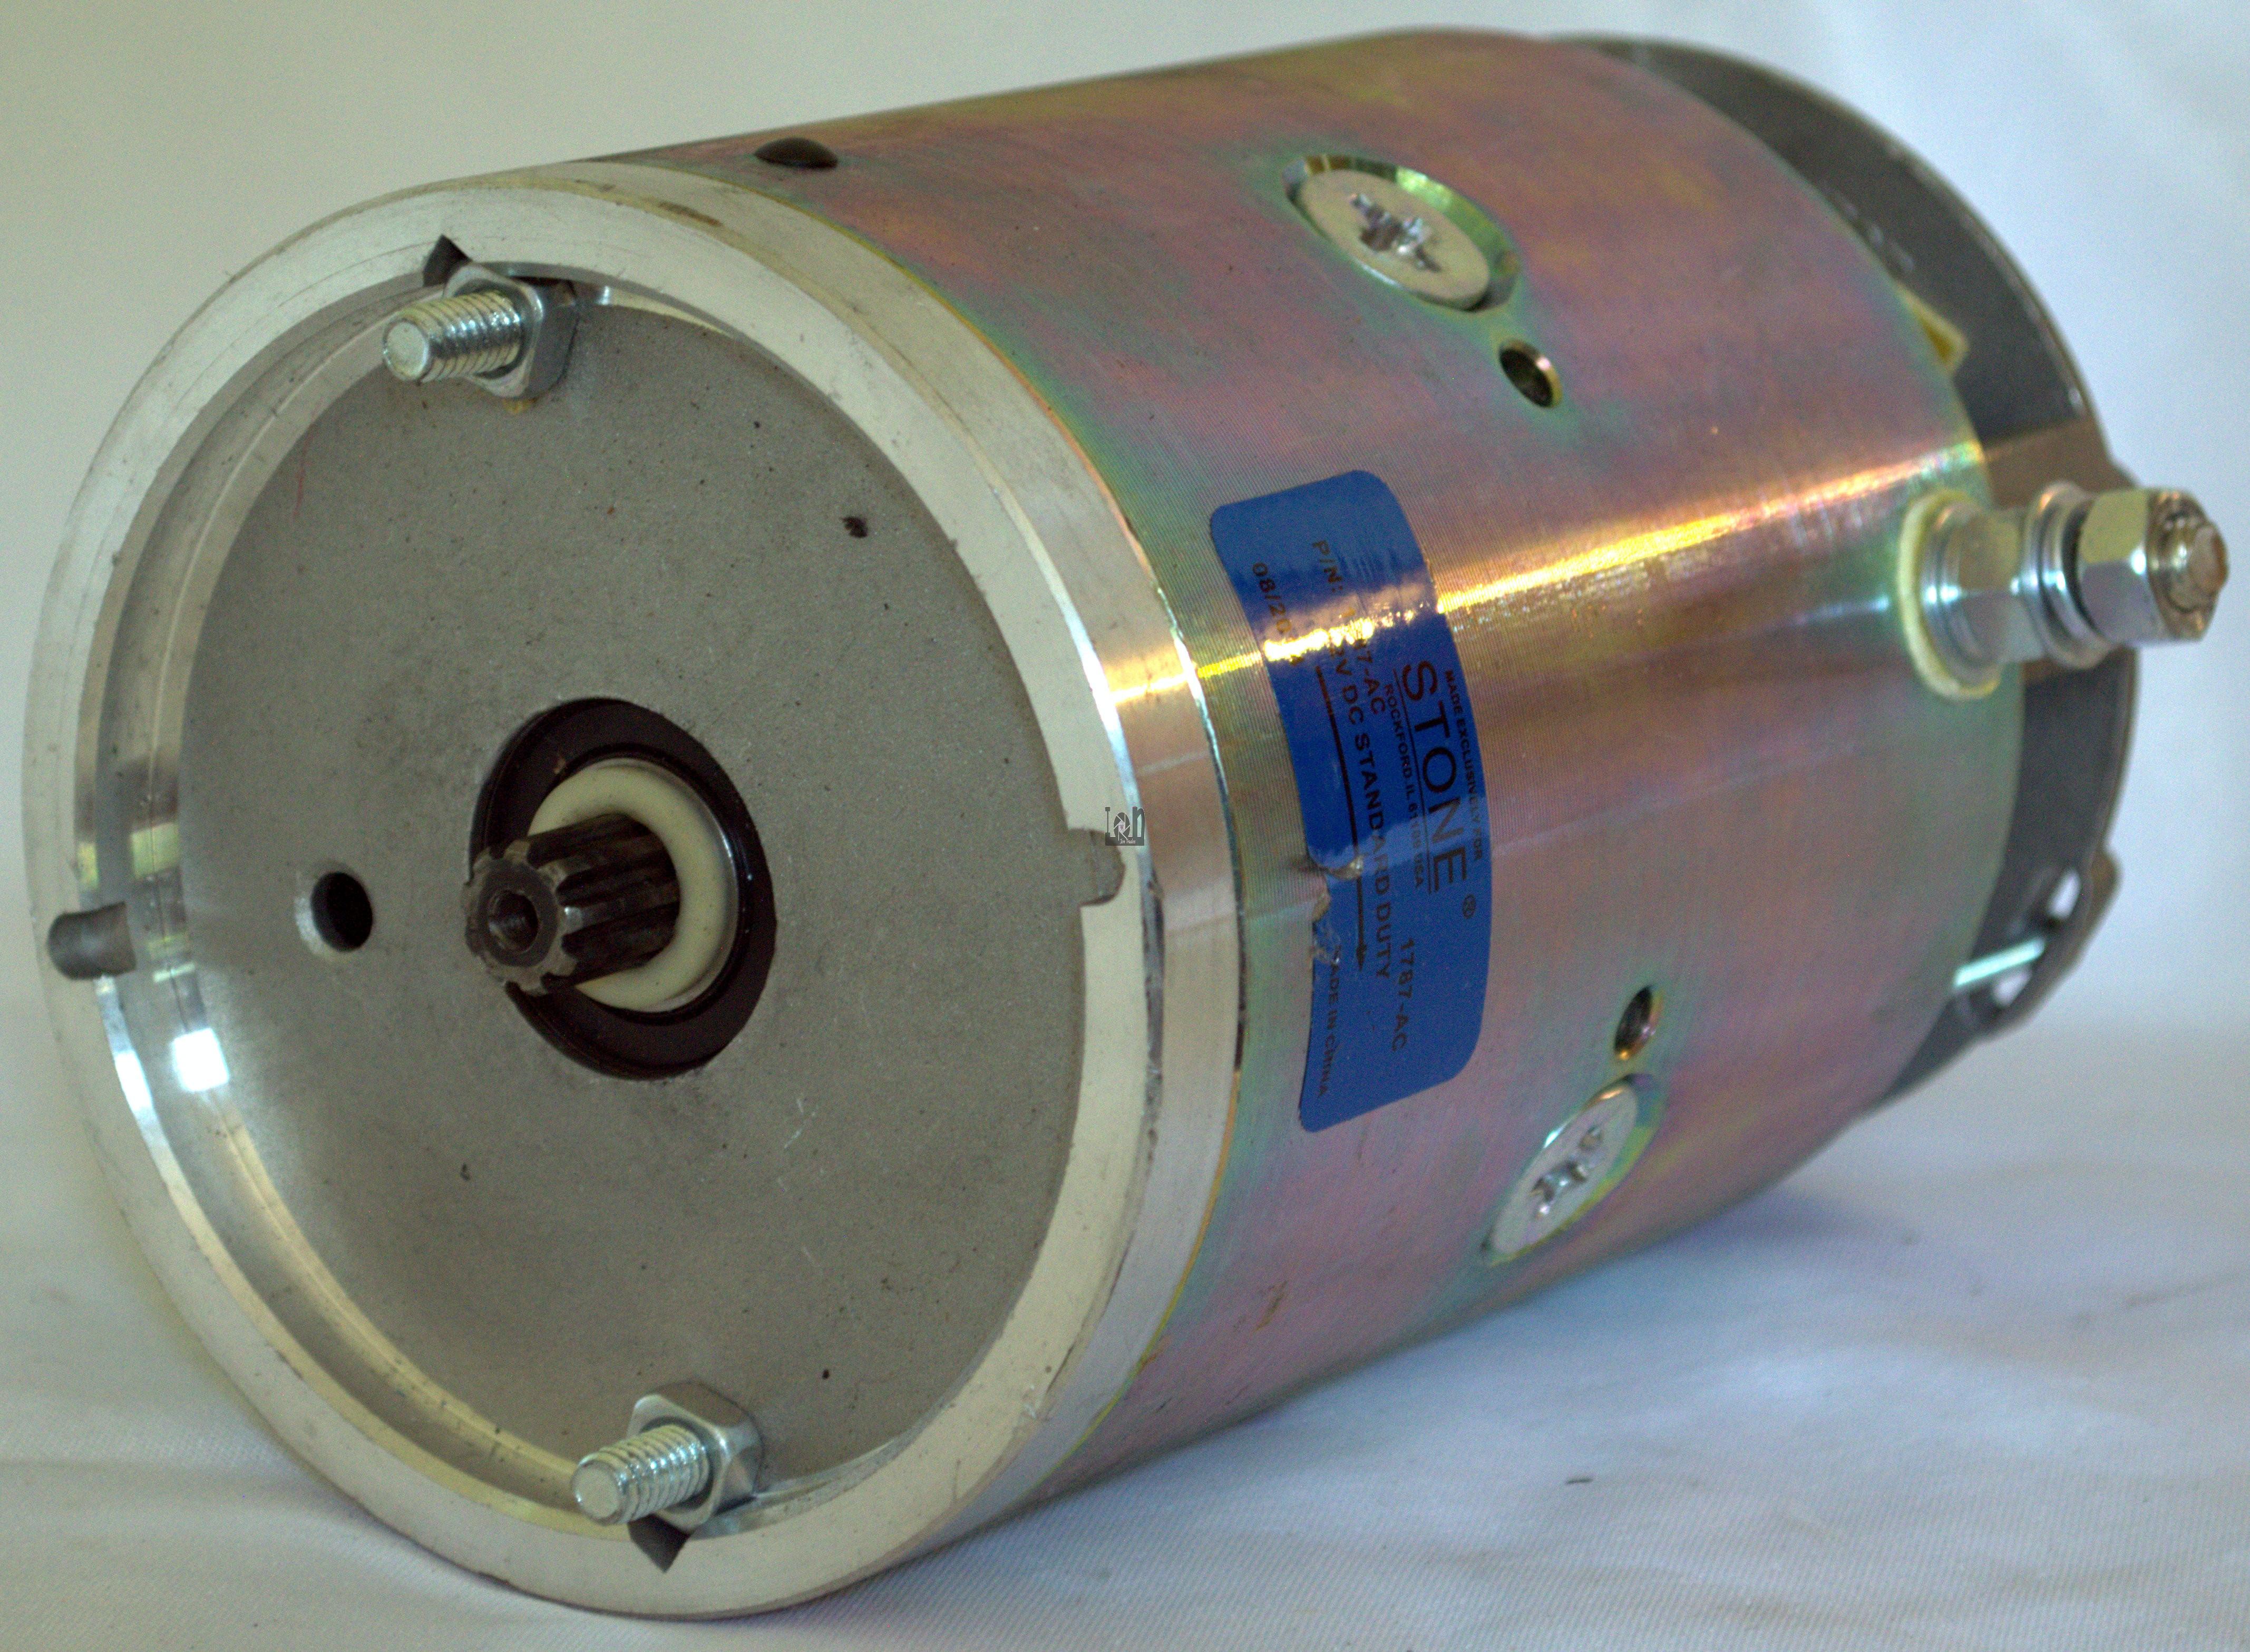 12V DC Pump Motor 1787-AC 2.68HP Maxxon Fenner Lift Gate Parts